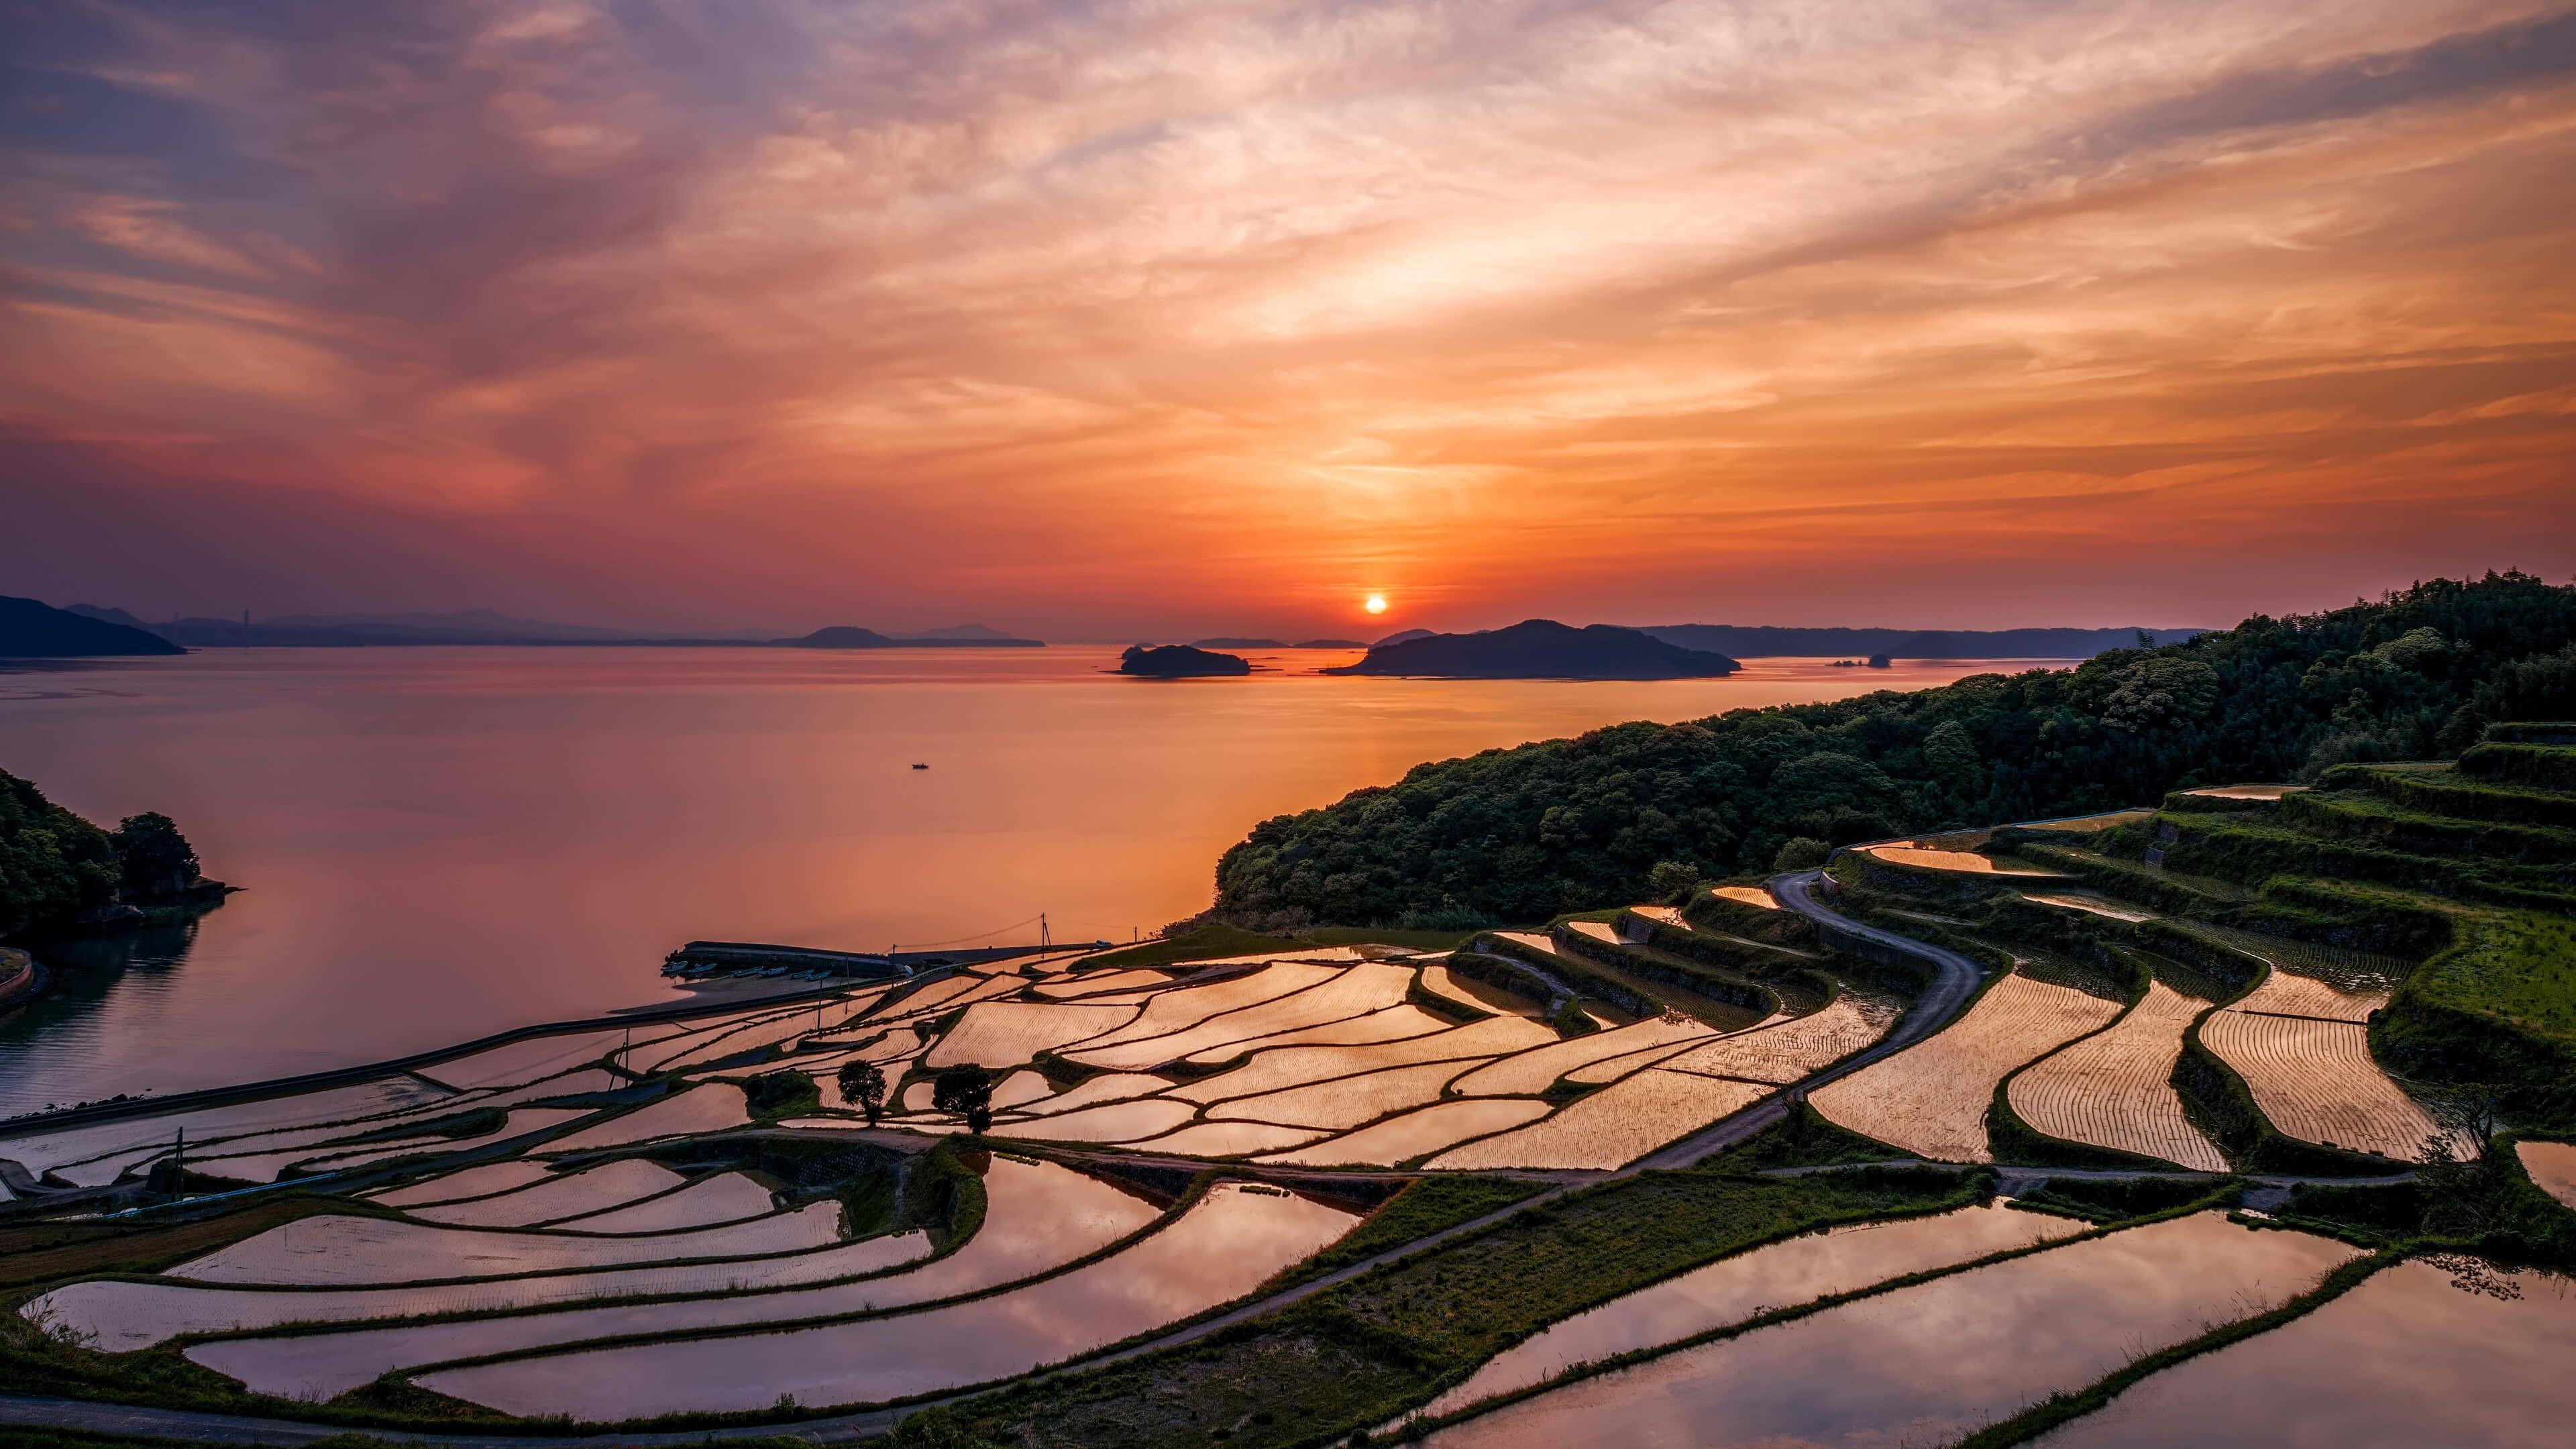 Japan's Rise Fields at Sunset 4K Wallpaper